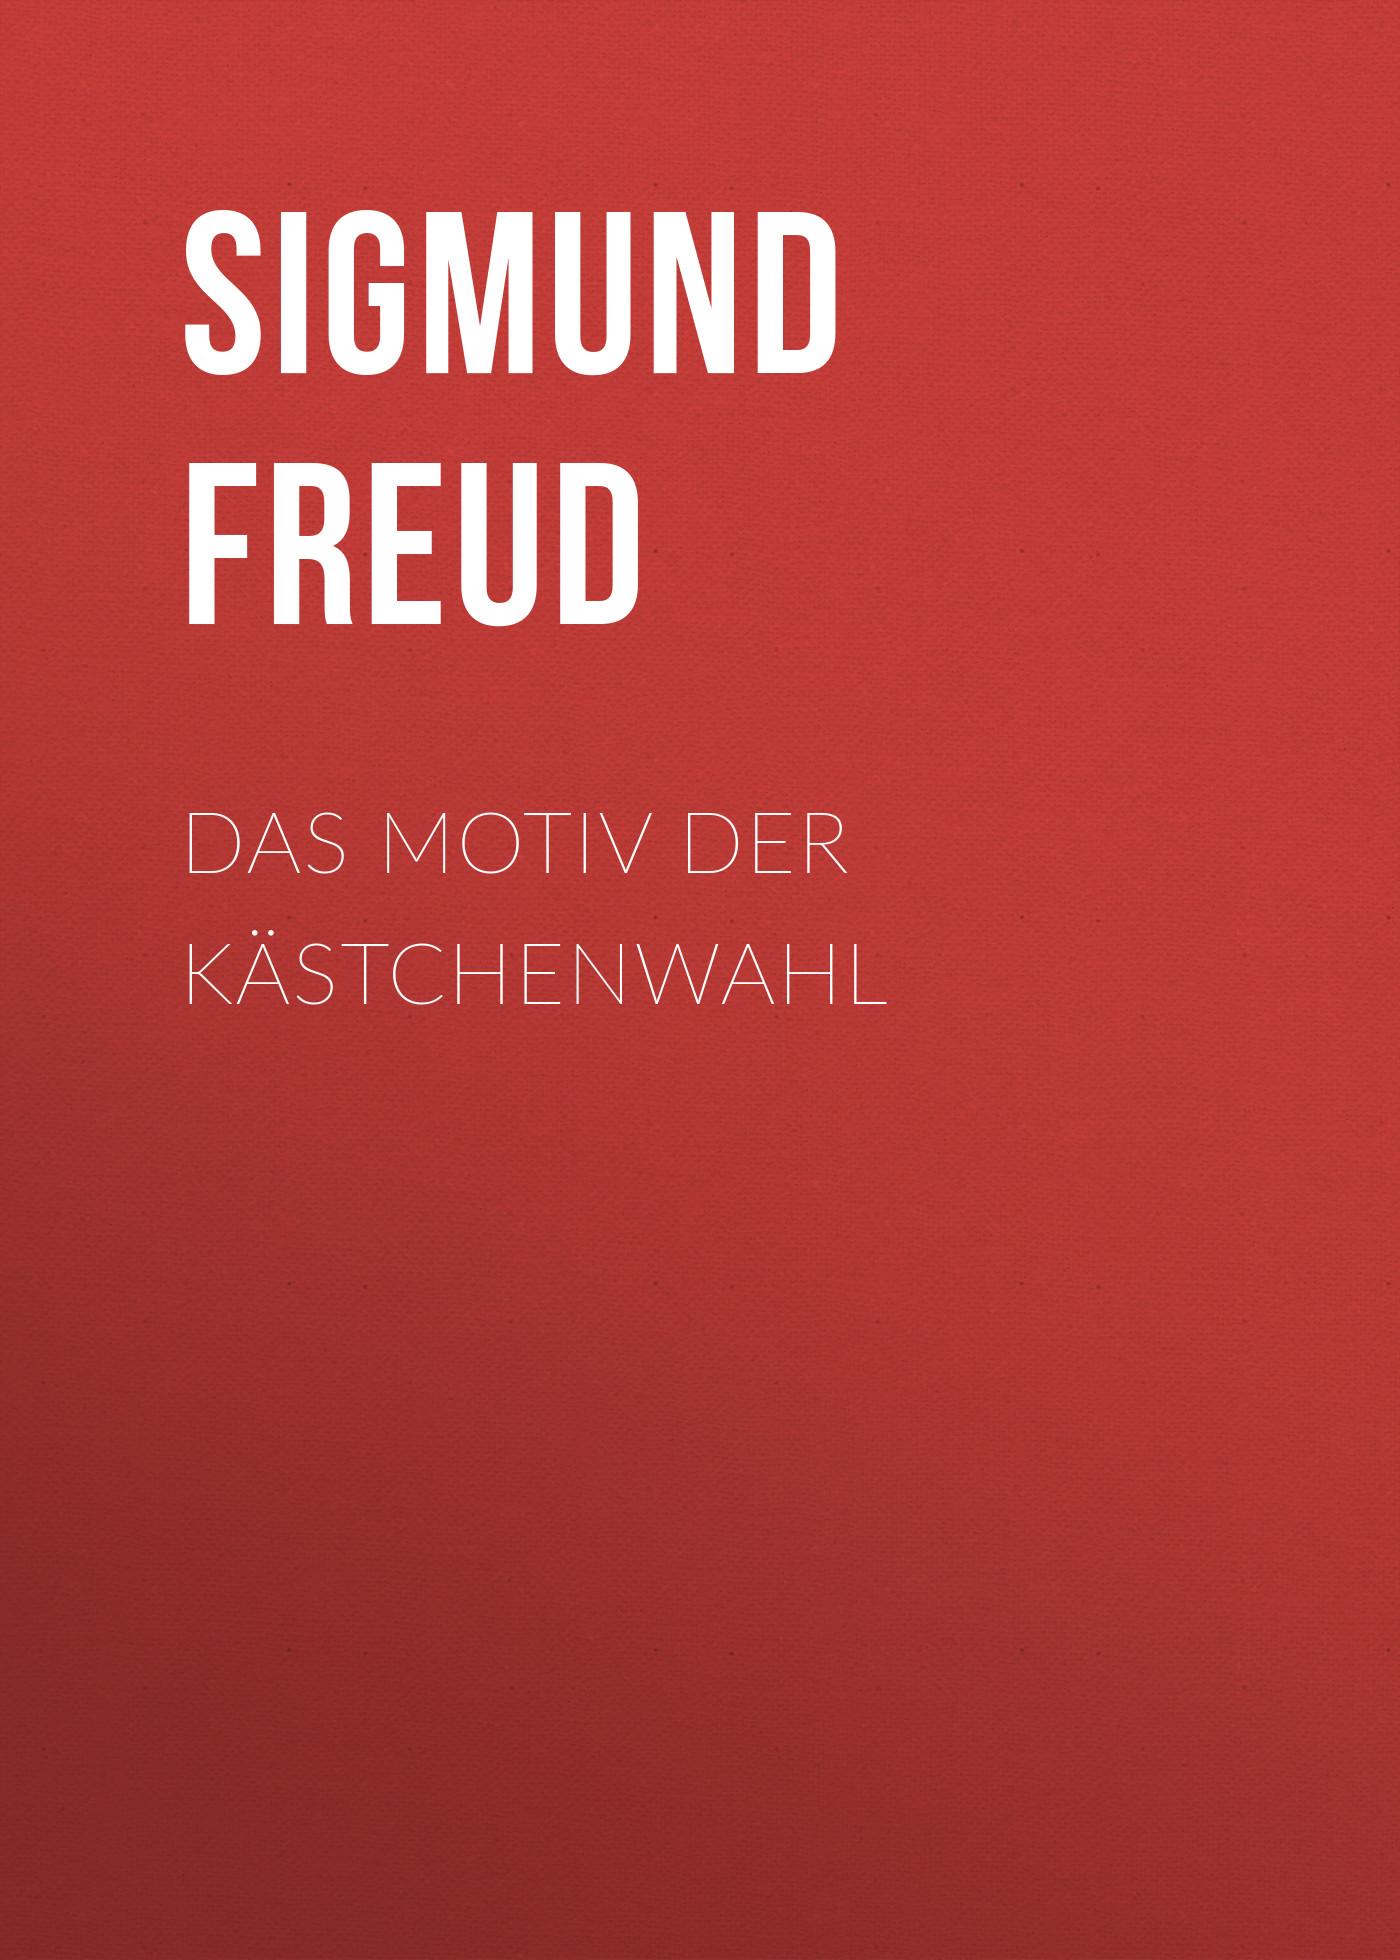 Зигмунд Фрейд Das Motiv der Kästchenwahl надеждин н зигмунд фрейд за гранью сознания